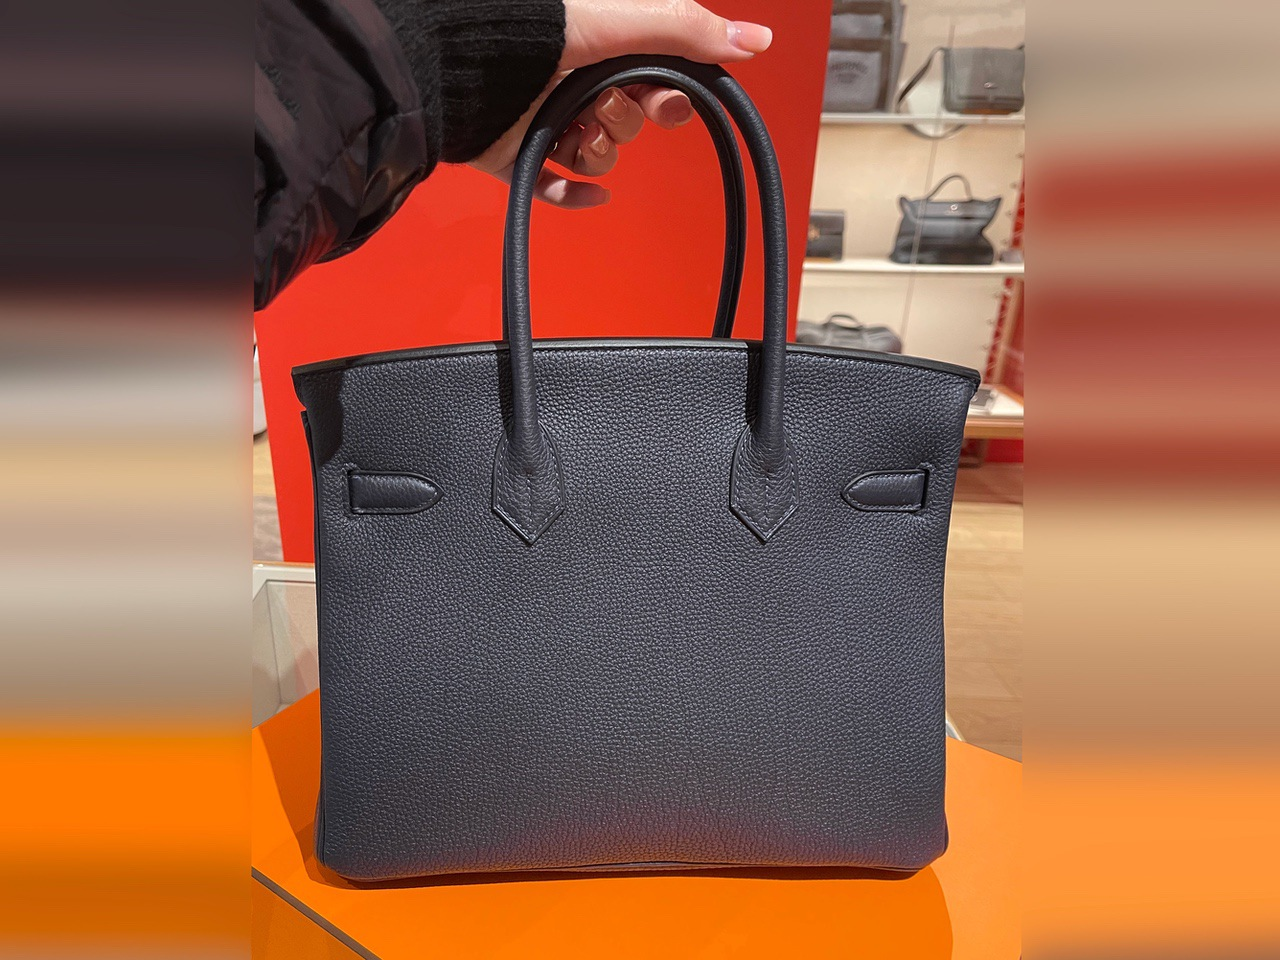 Hermès-Birkin-30-Togo-Bleu-Nuit-1